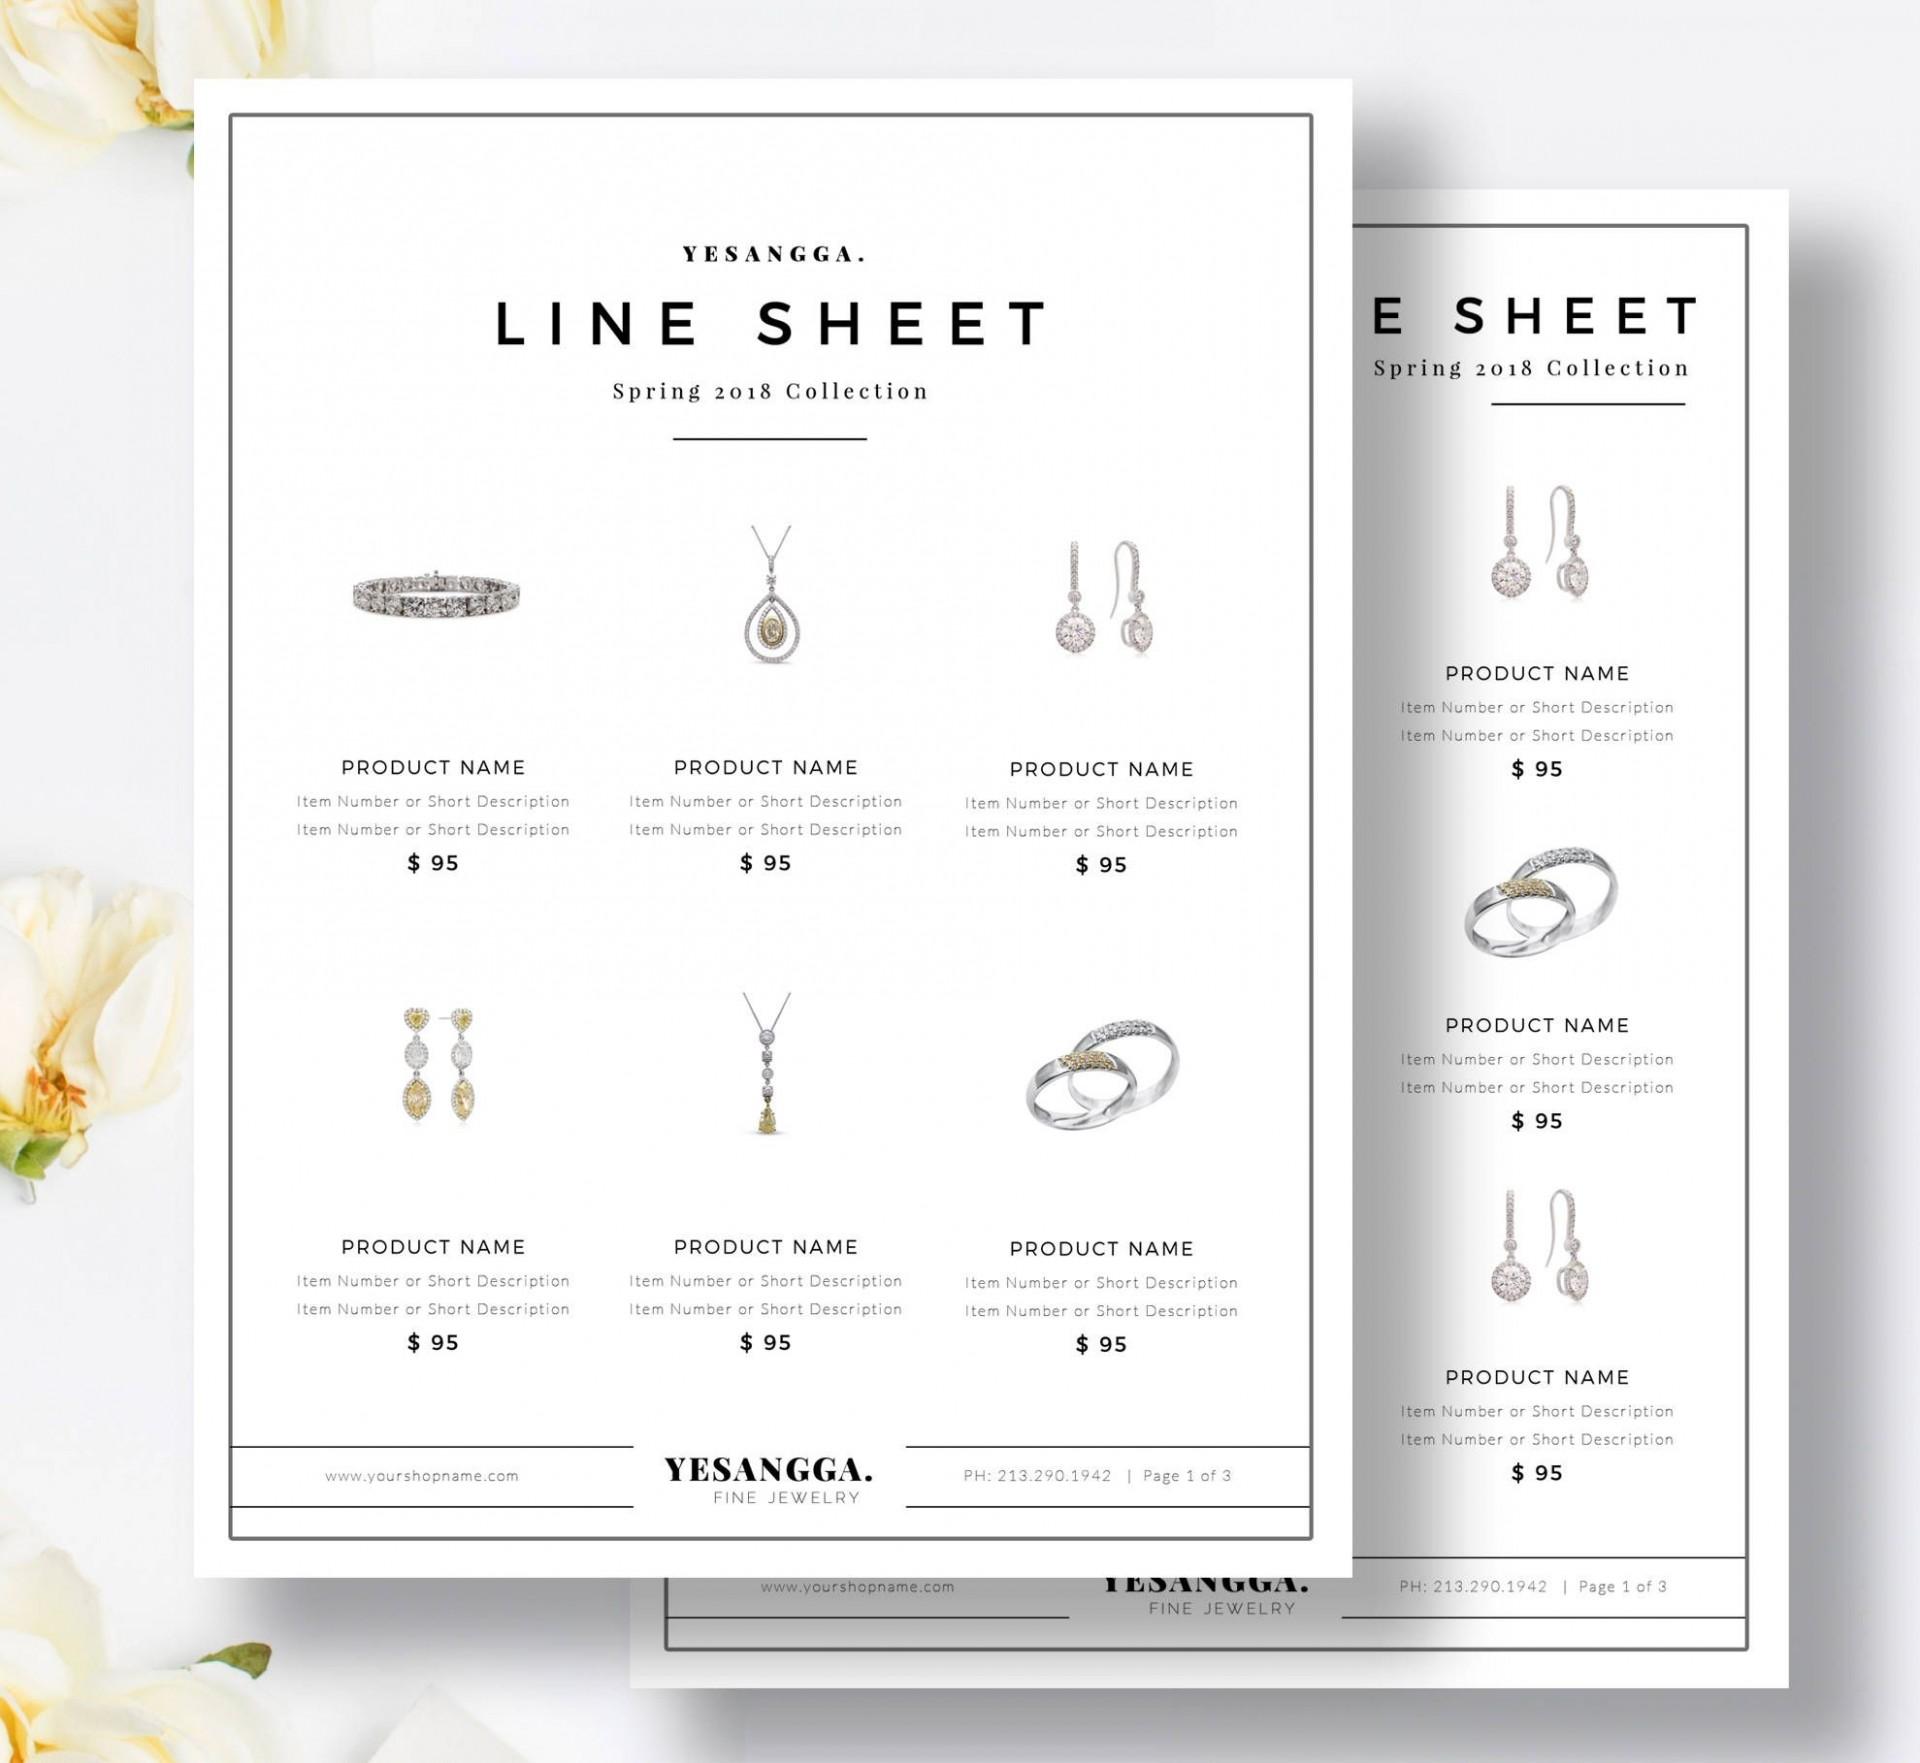 006 Unusual Wholesale Line Sheet Template Sample  Excel1920